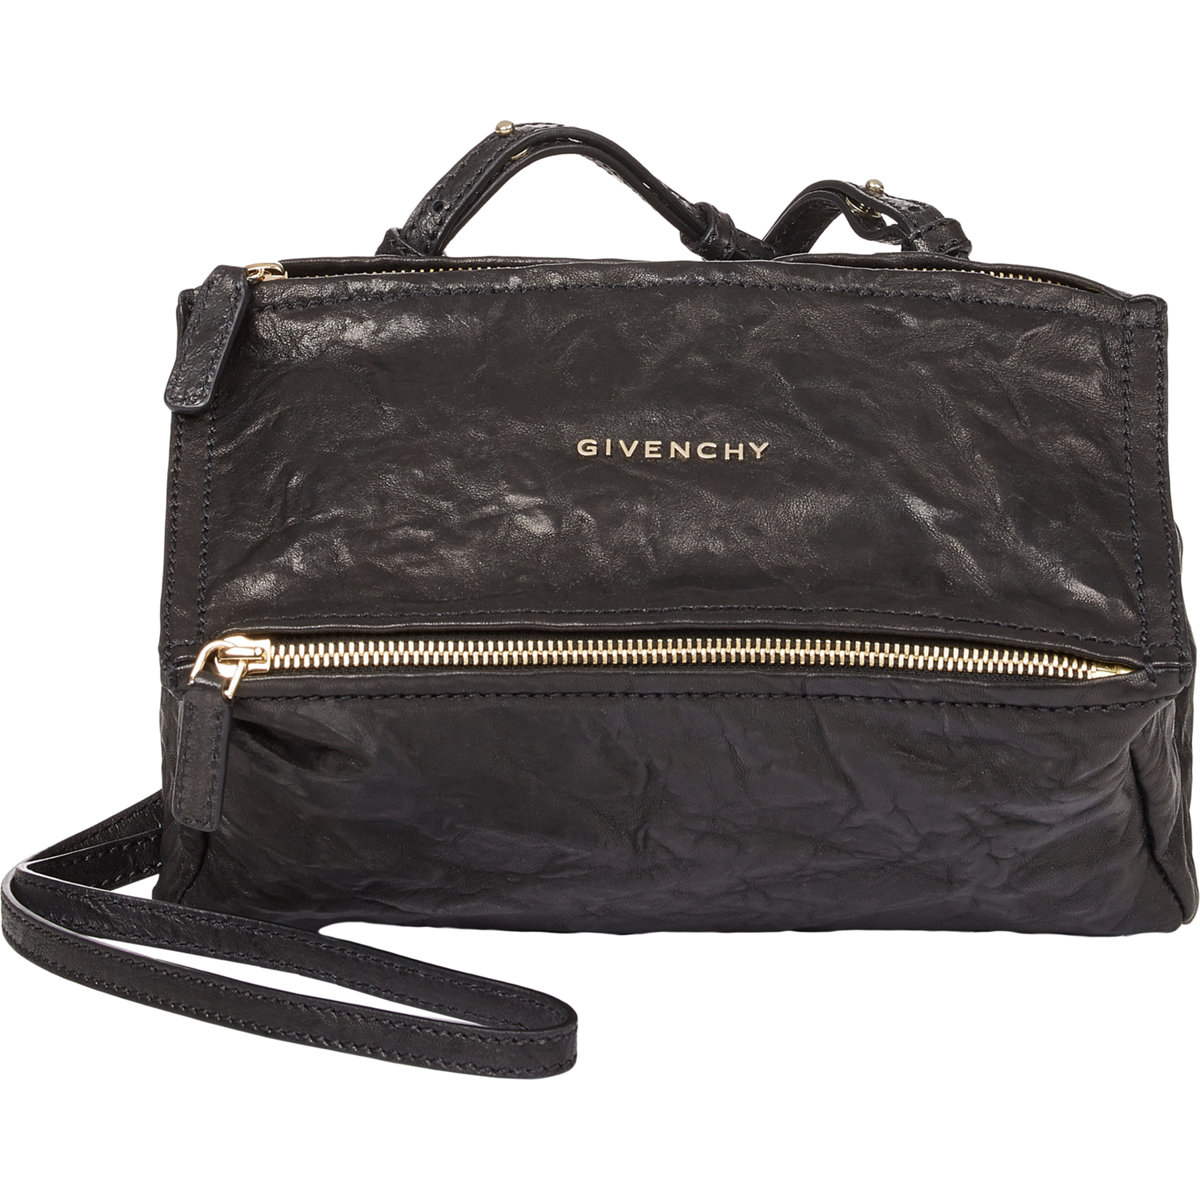 Womens Pandora Pepe Mini Patent Leather Messenger Bag Givenchy